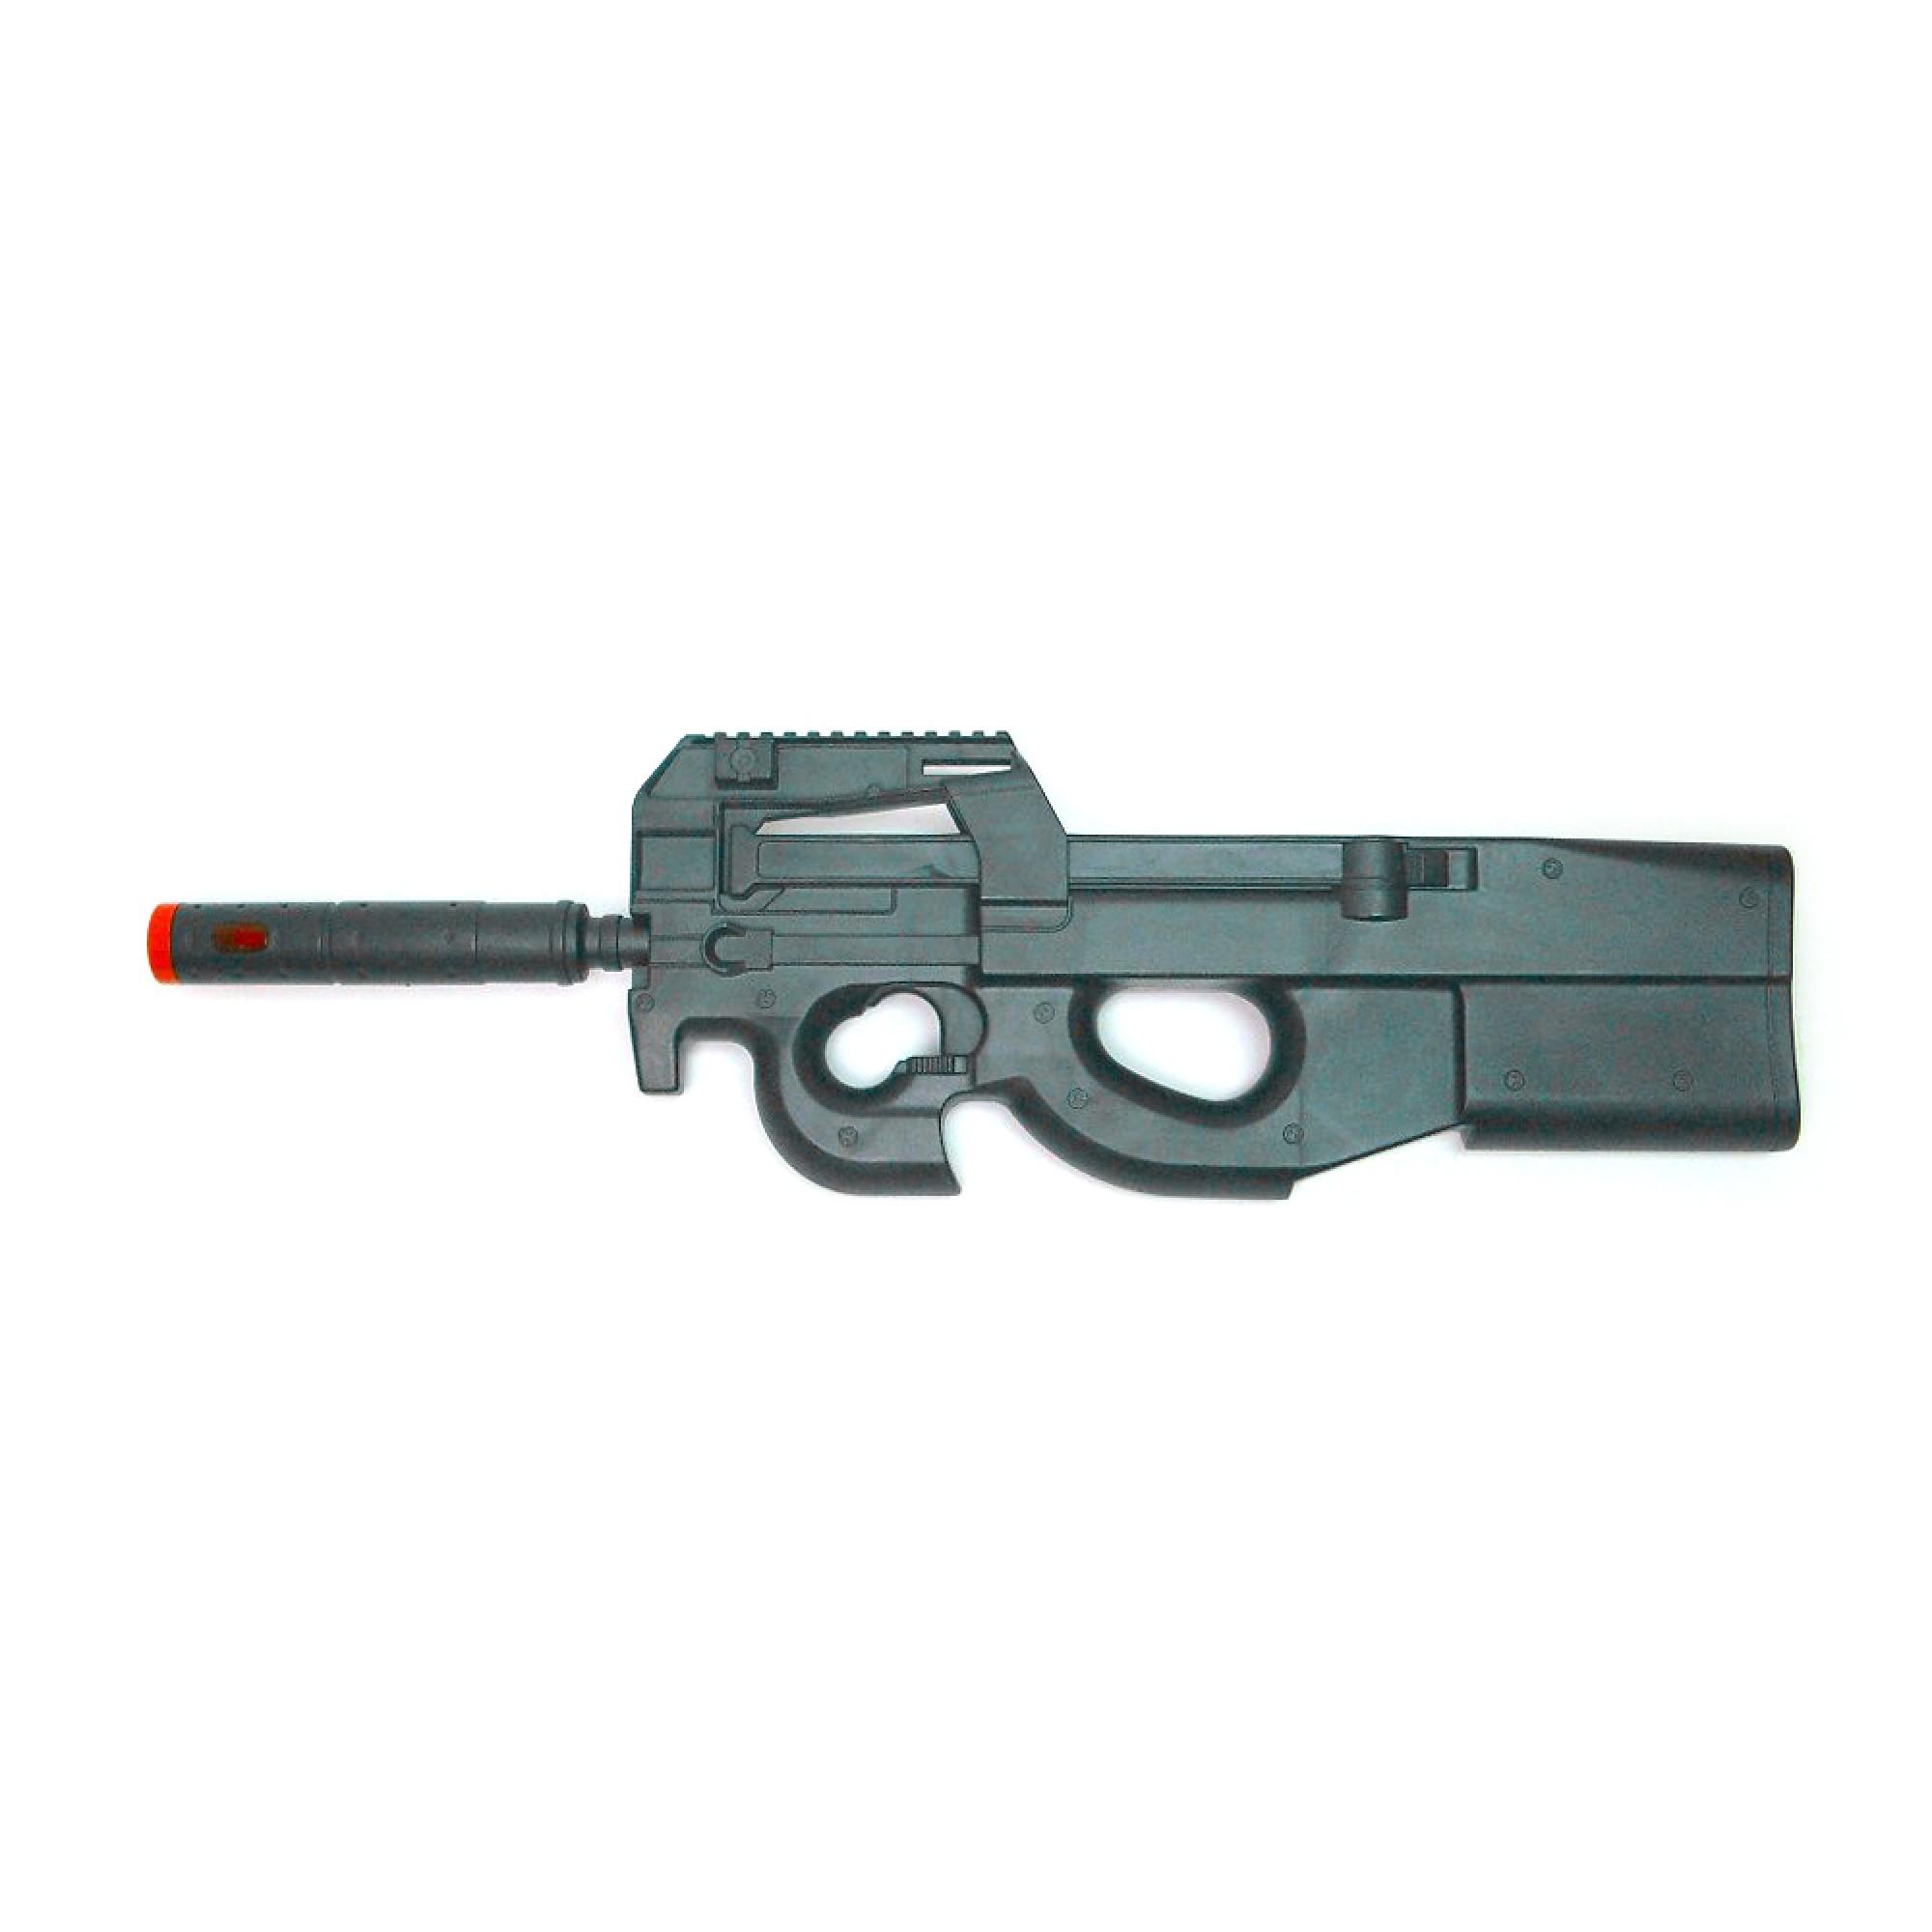 P90 Tar W/Light, Sound & Vibration